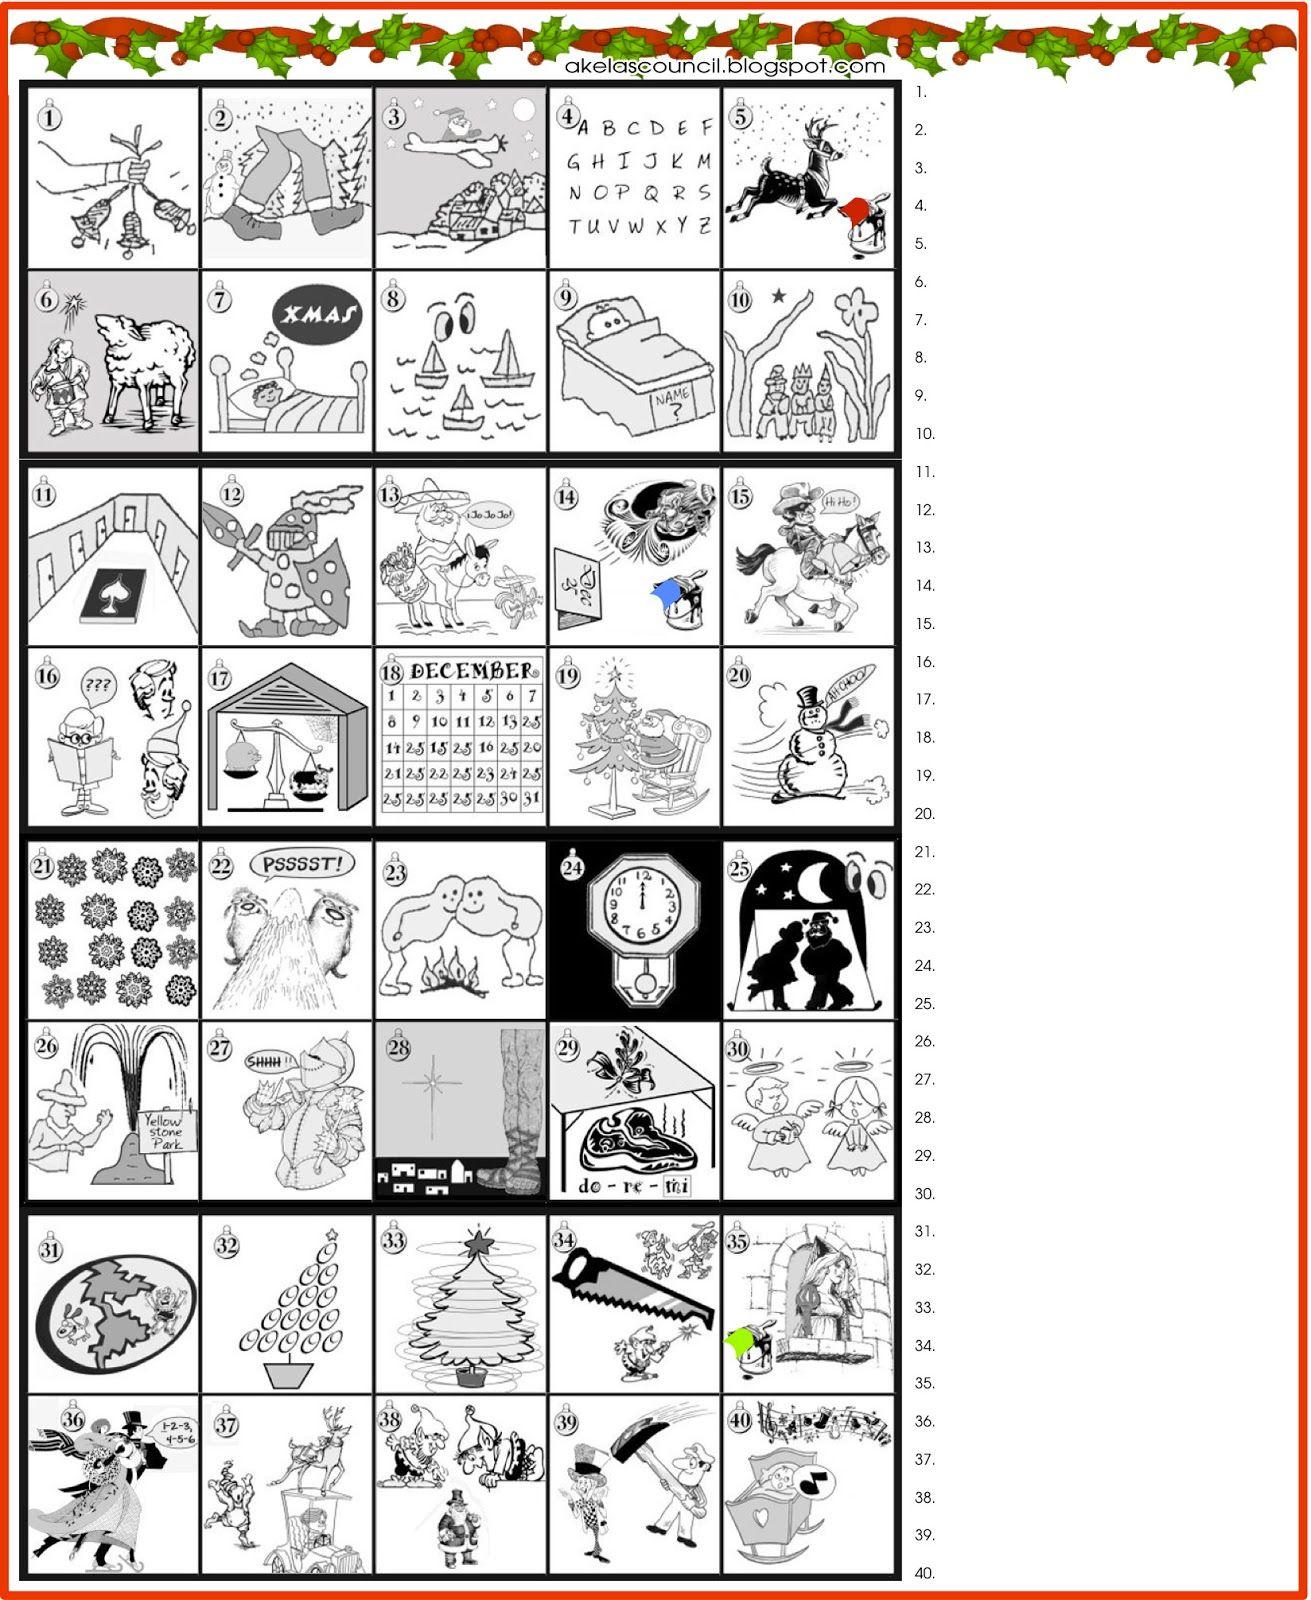 Printable * Guess The Christmas Songs Or Carols Word Puzzle - Printable Puzzles Christmas